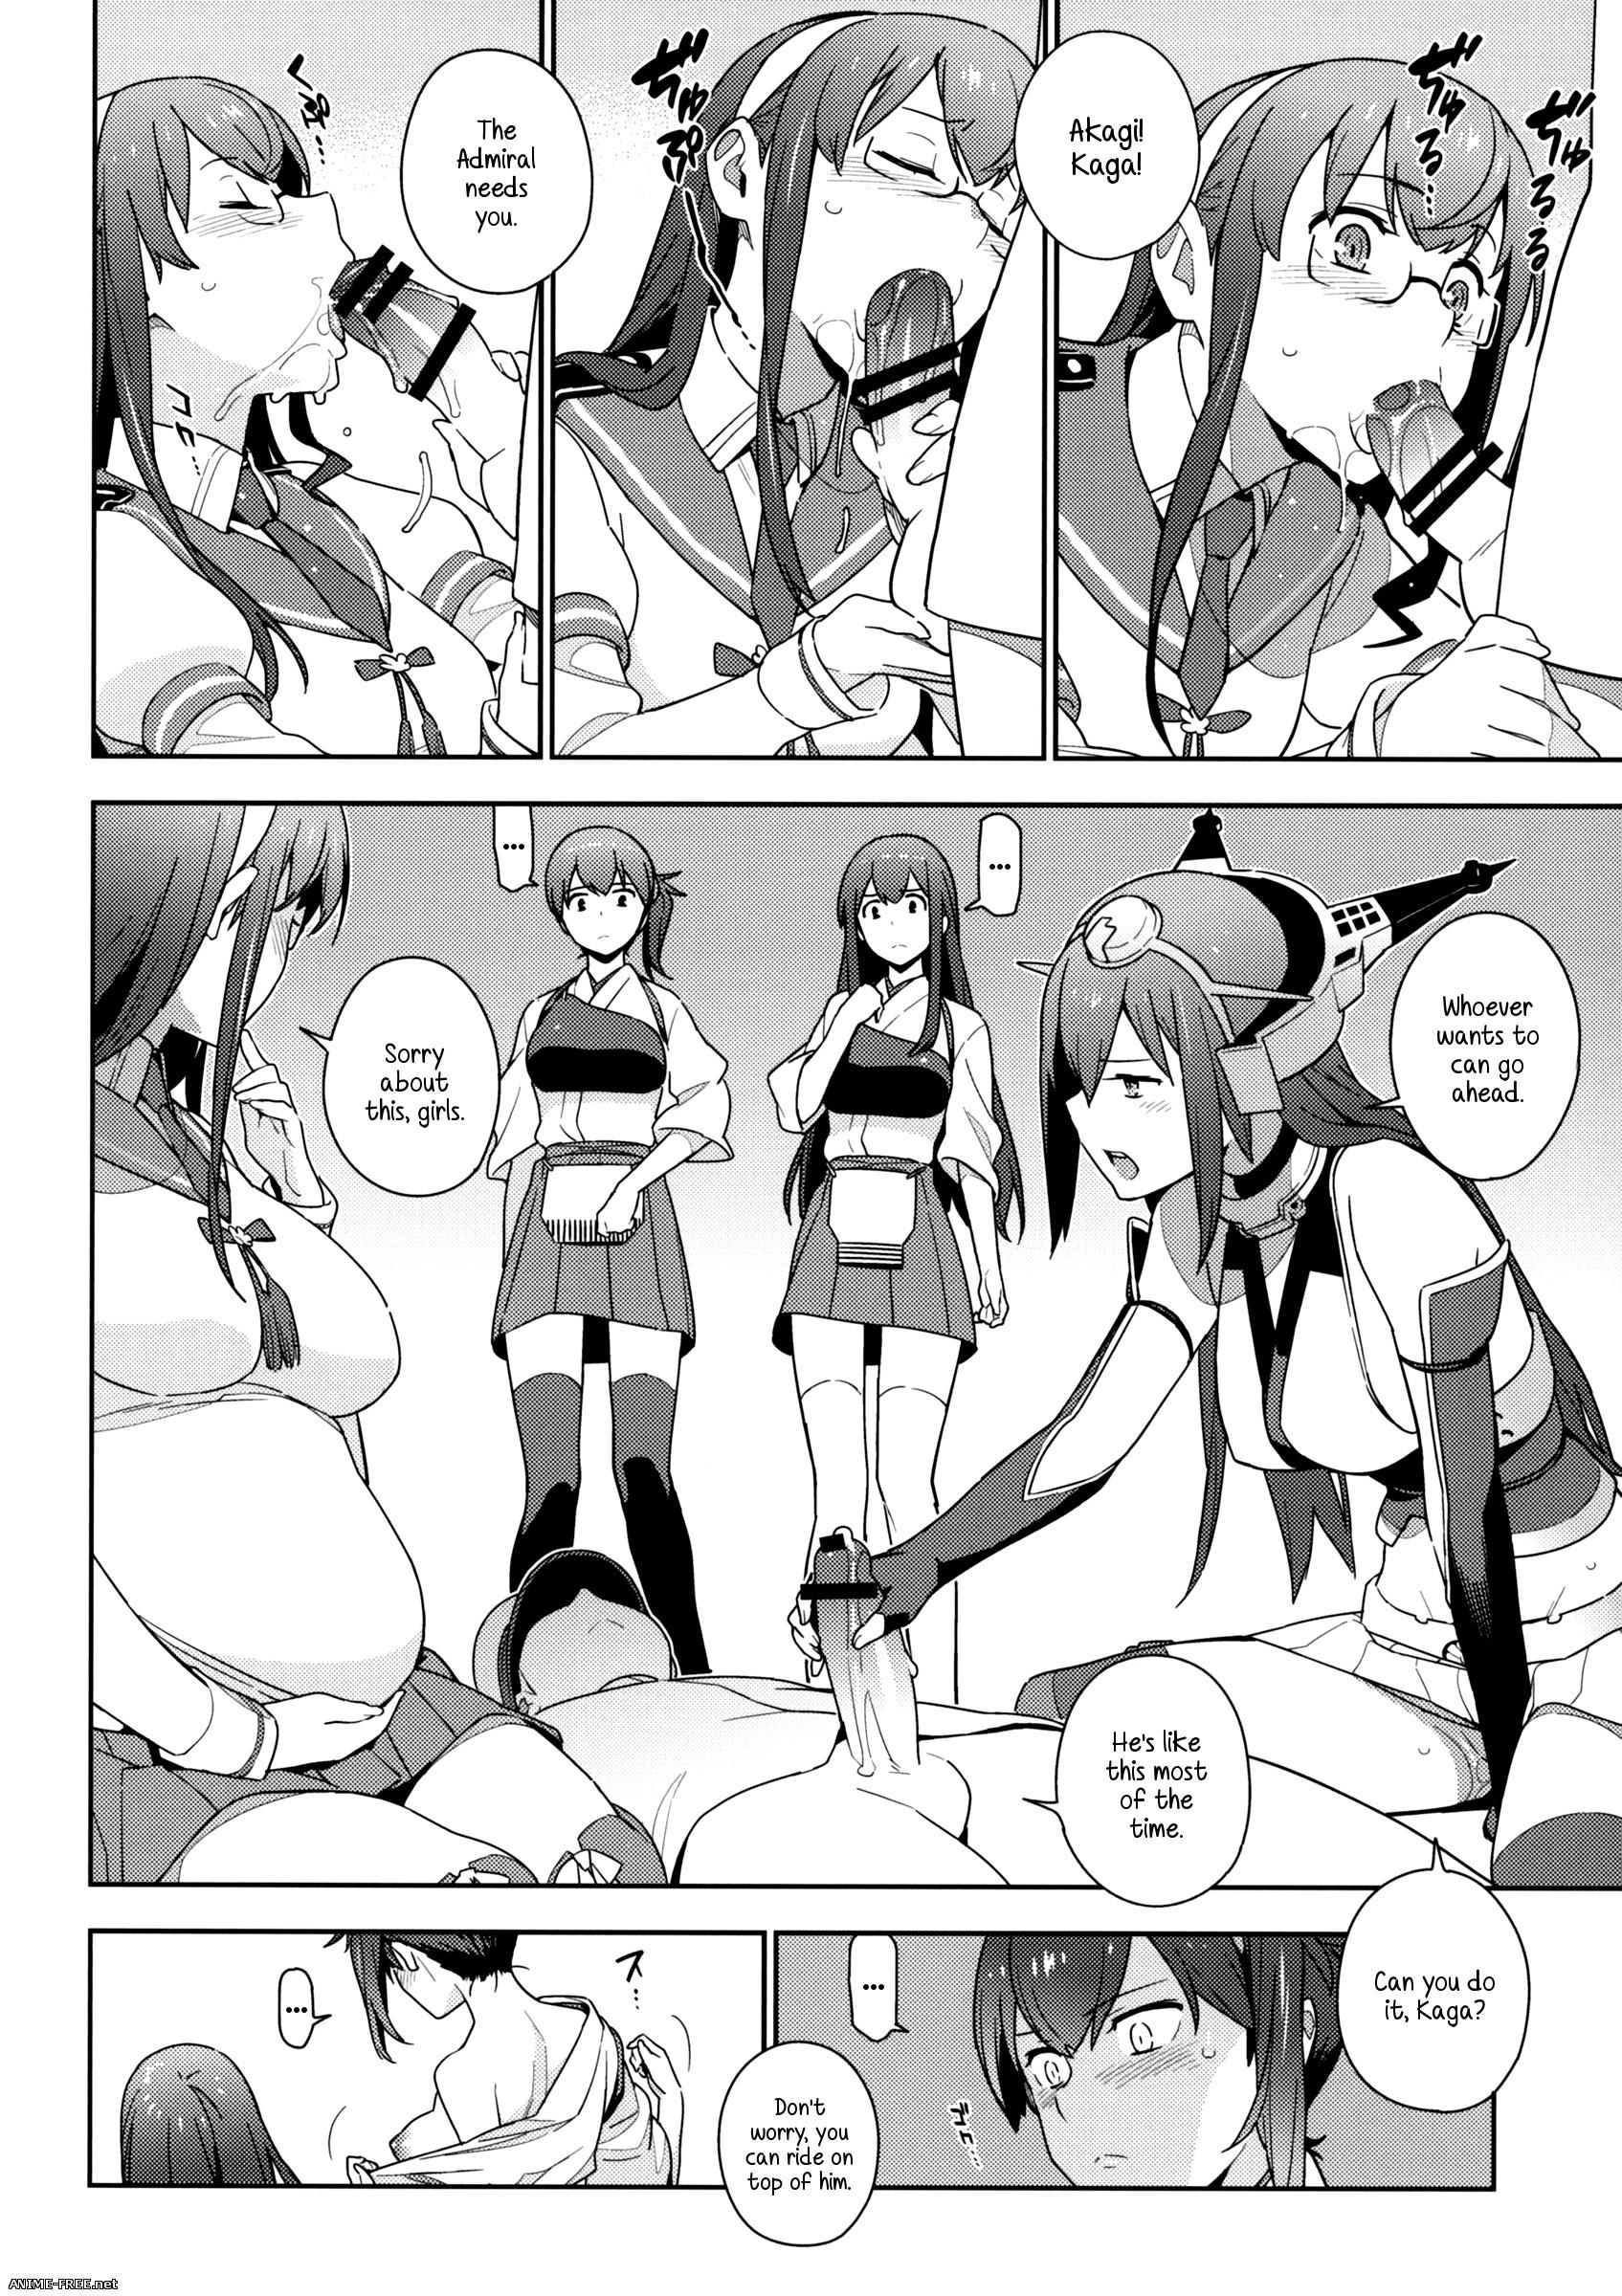 Yukimi / Enuma Elish / Chakapoko Honpo - Сборник манги [Ptcen] [ENG,RUS,JAP] Manga Hentai